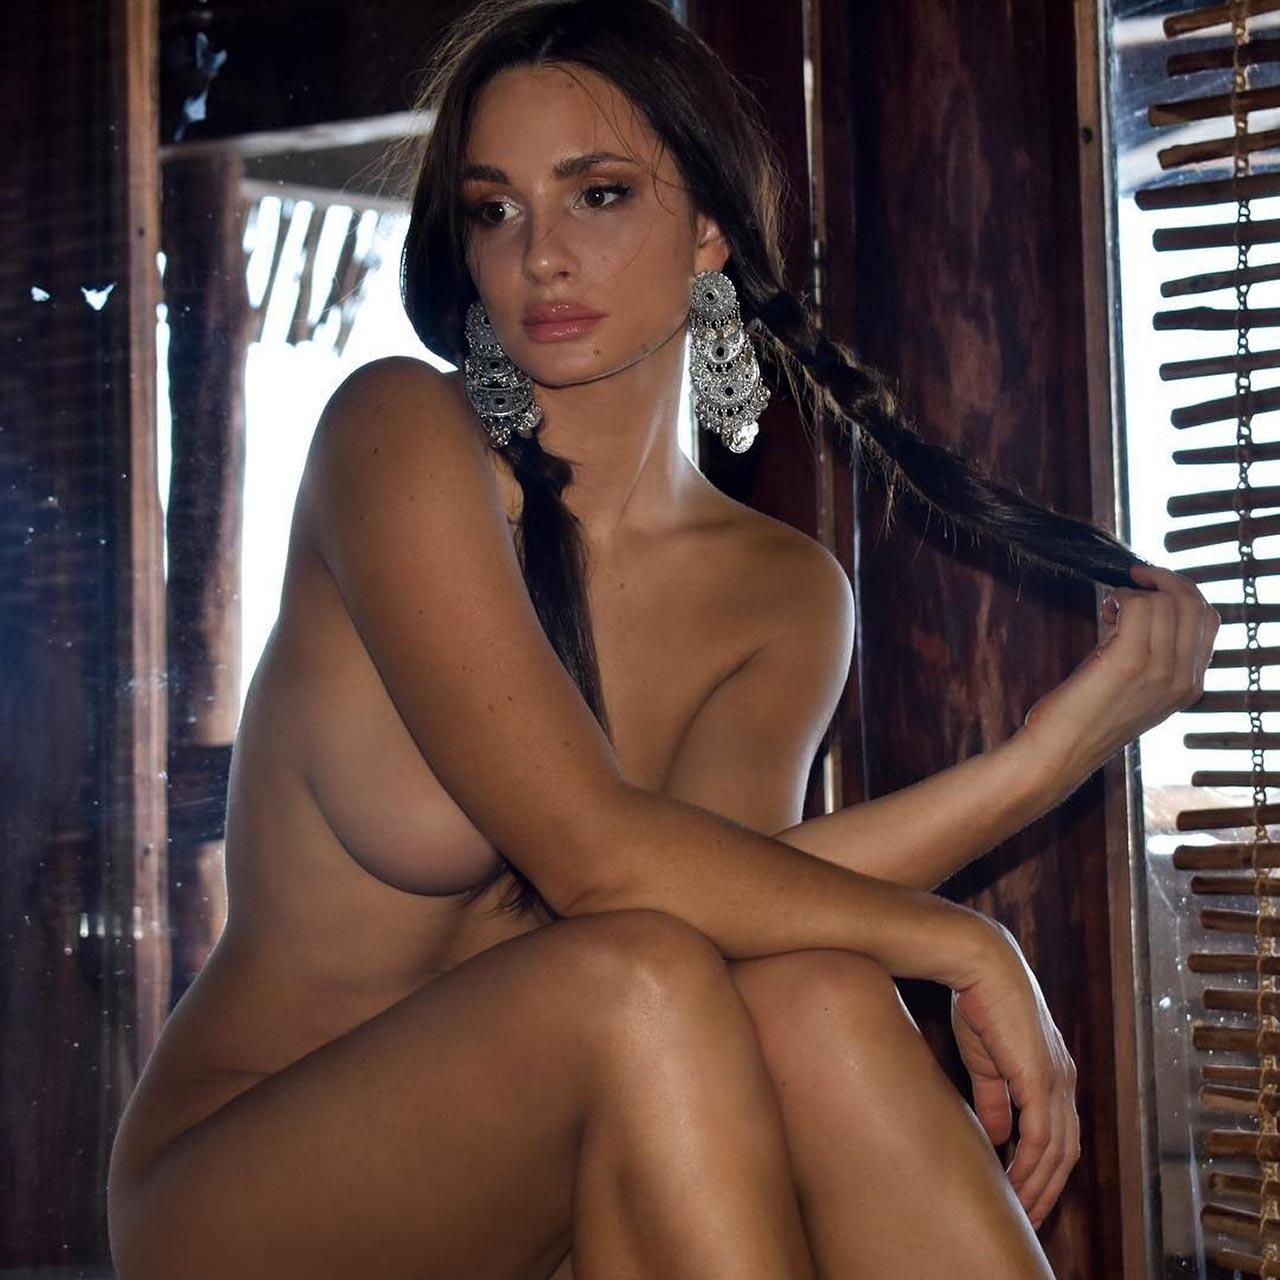 Paparazzi Holly Rickwood nude (71 photos), Pussy, Leaked, Feet, in bikini 2015